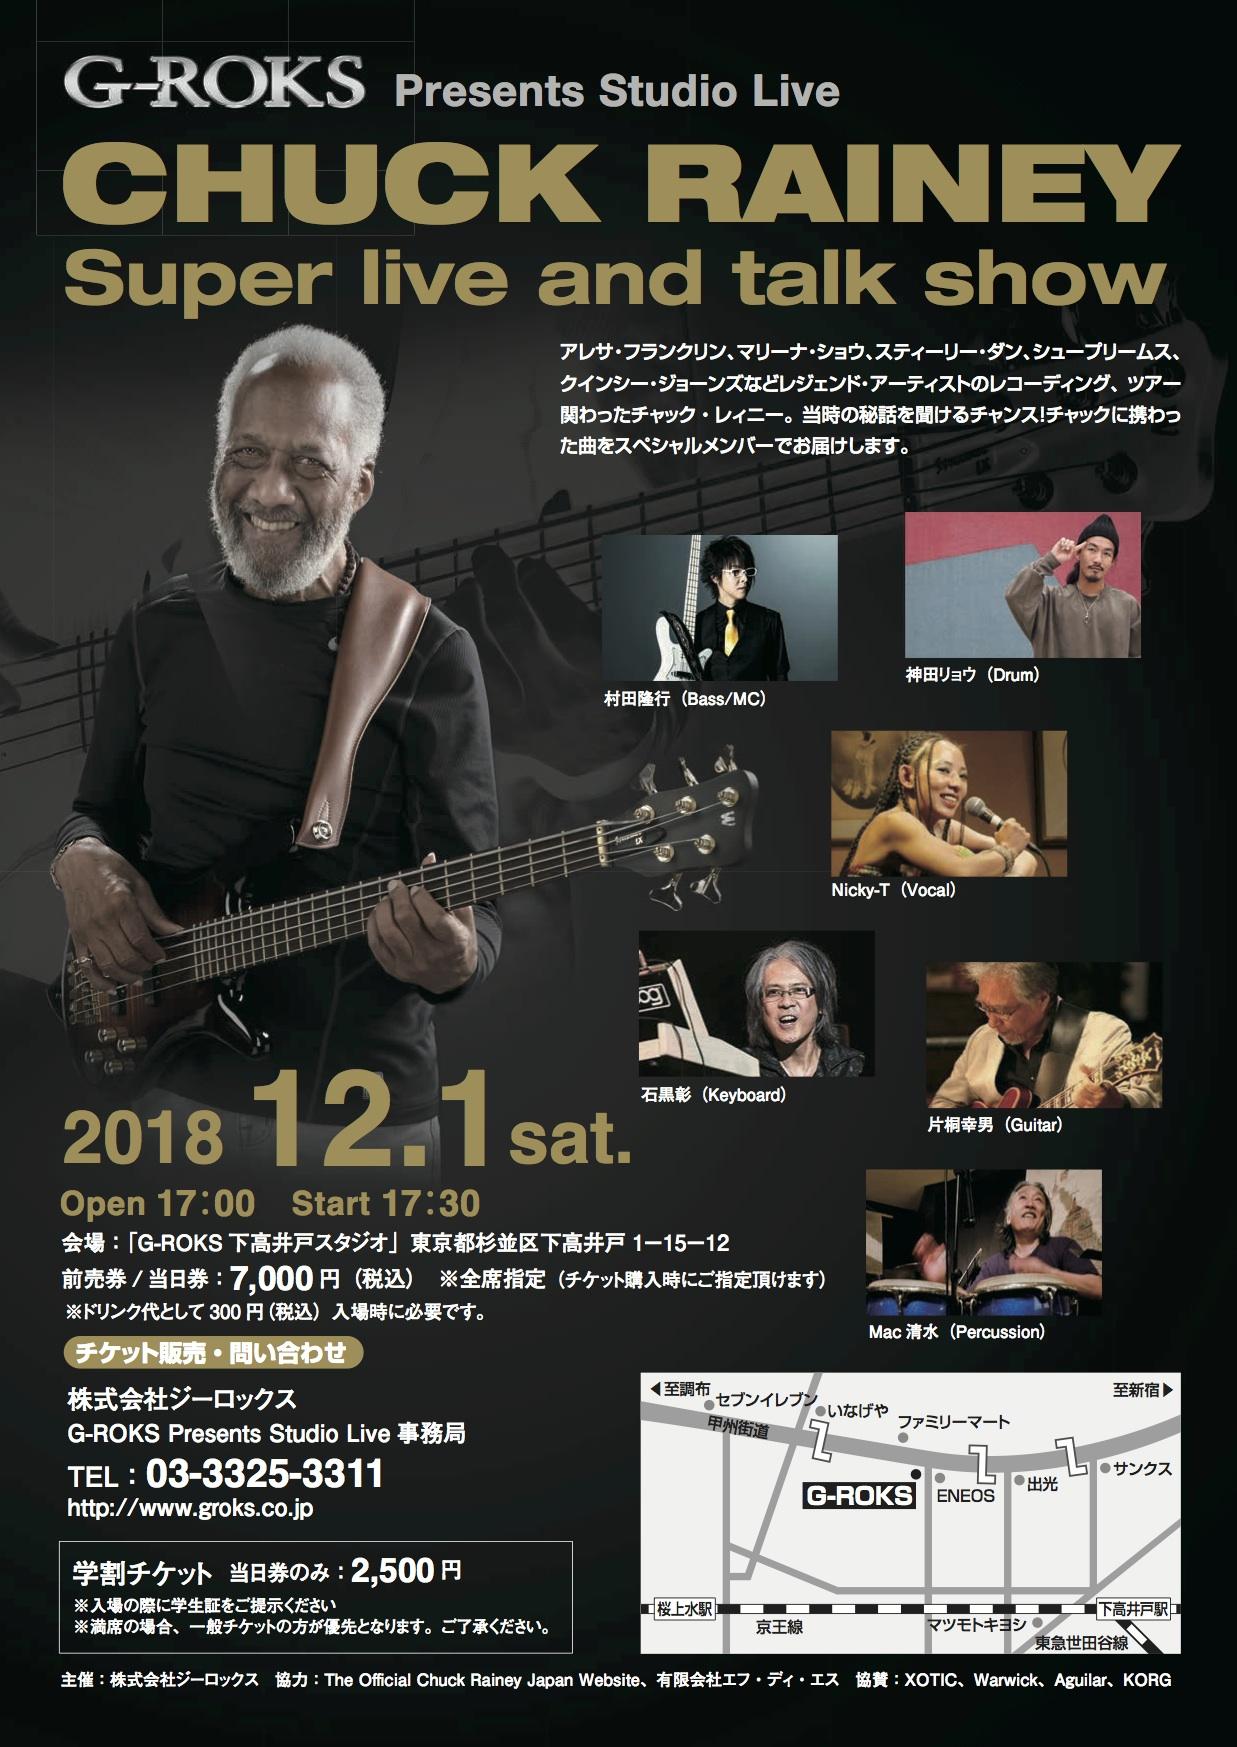 chuck rainey super live and talk show チャック レイニー 日本公式